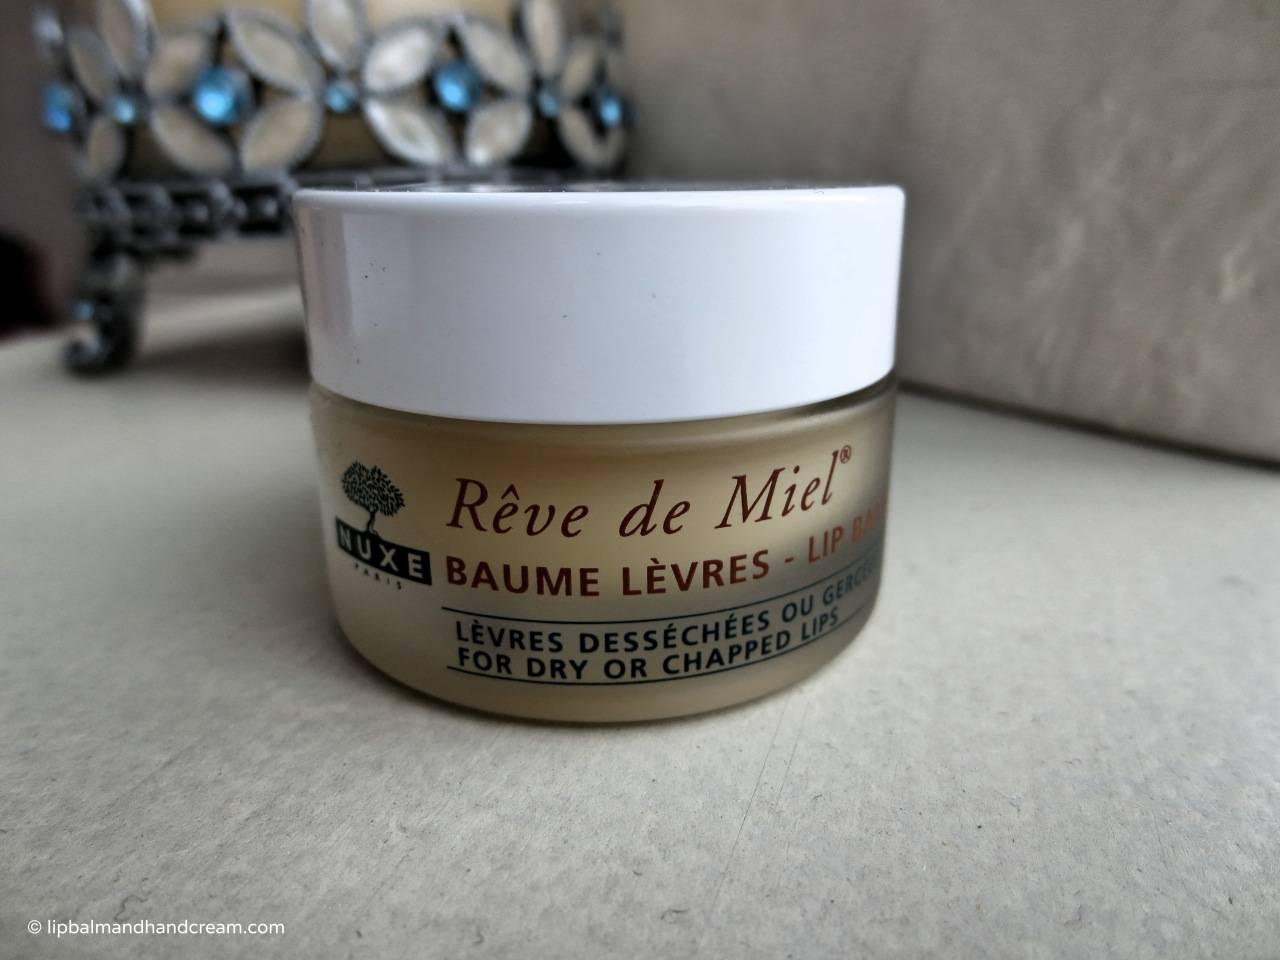 Nuxe's Rêve de Miel ultra-nourishing lip balm is the perfect partner for winter